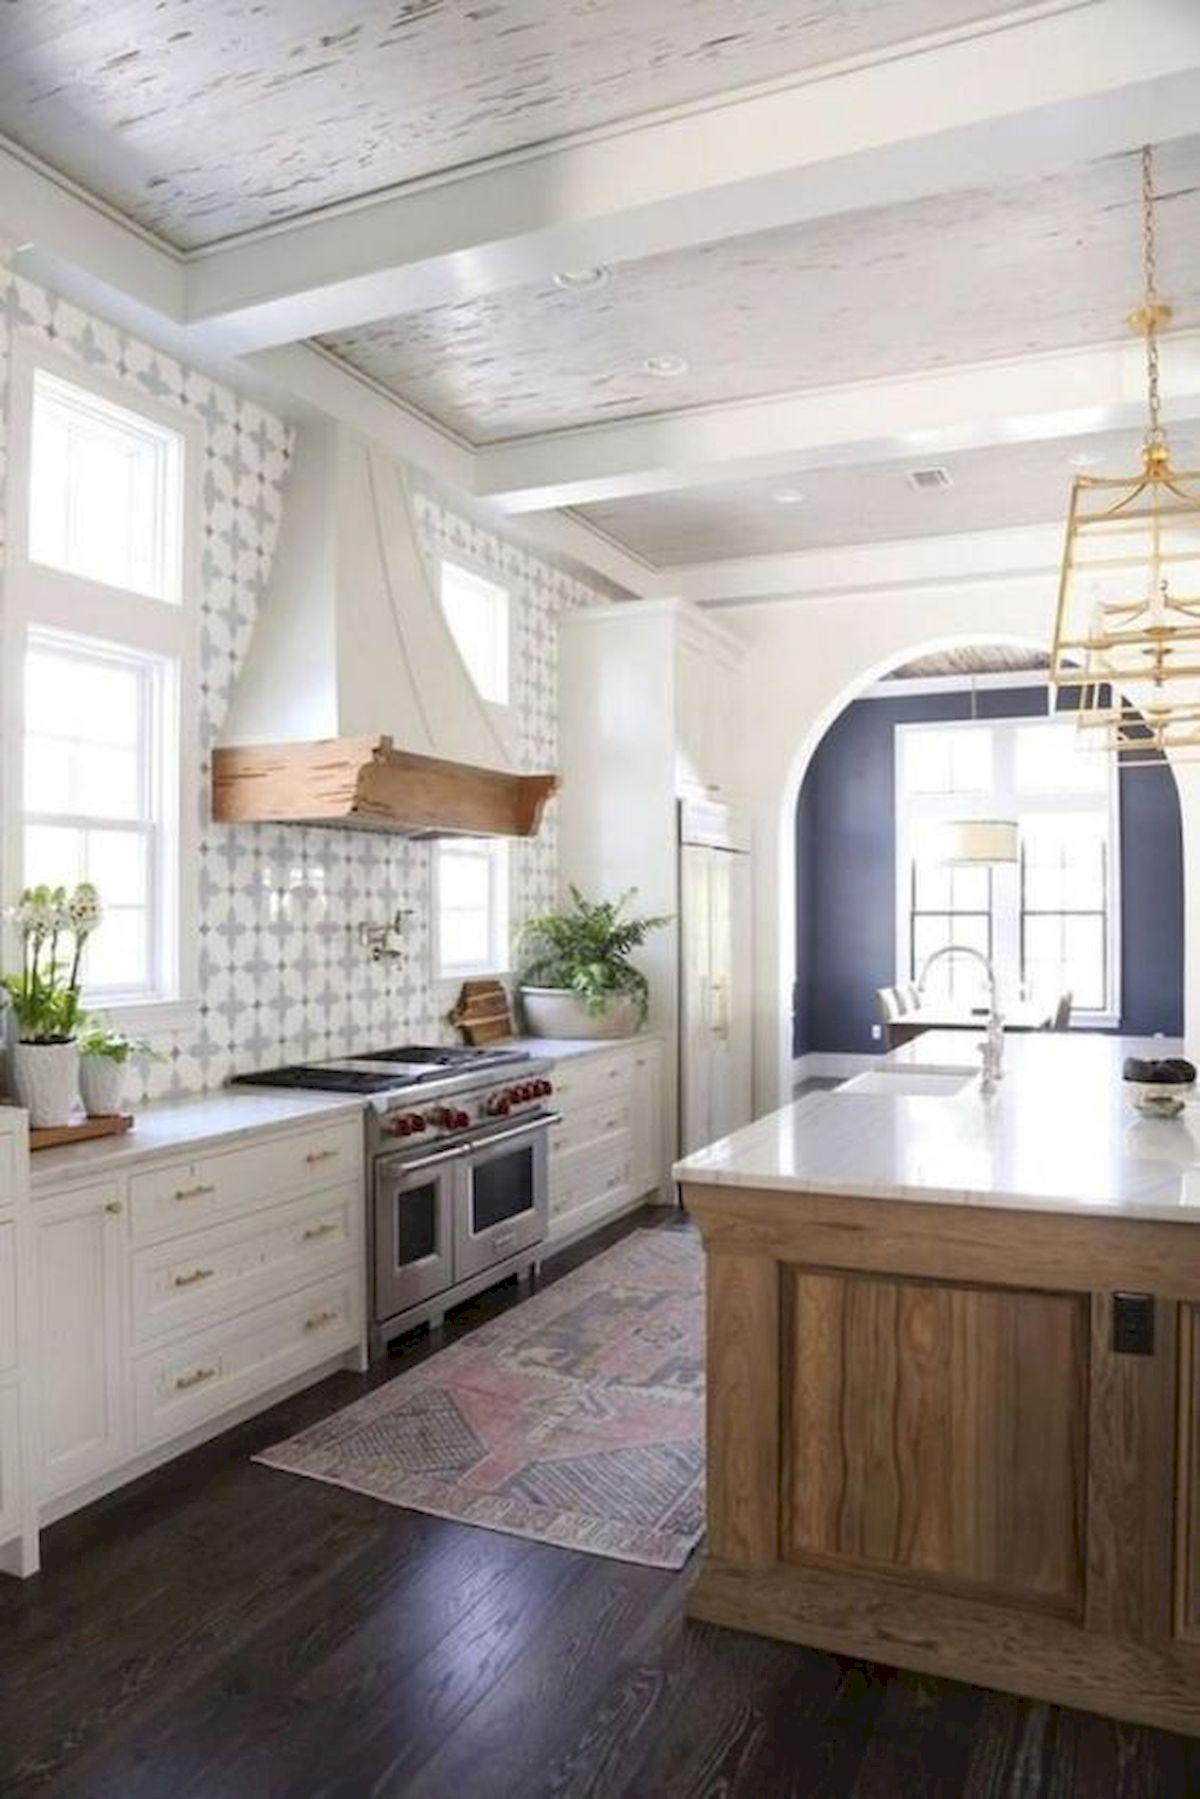 45 Easy Kitchen Decor and Design Ideas (9)